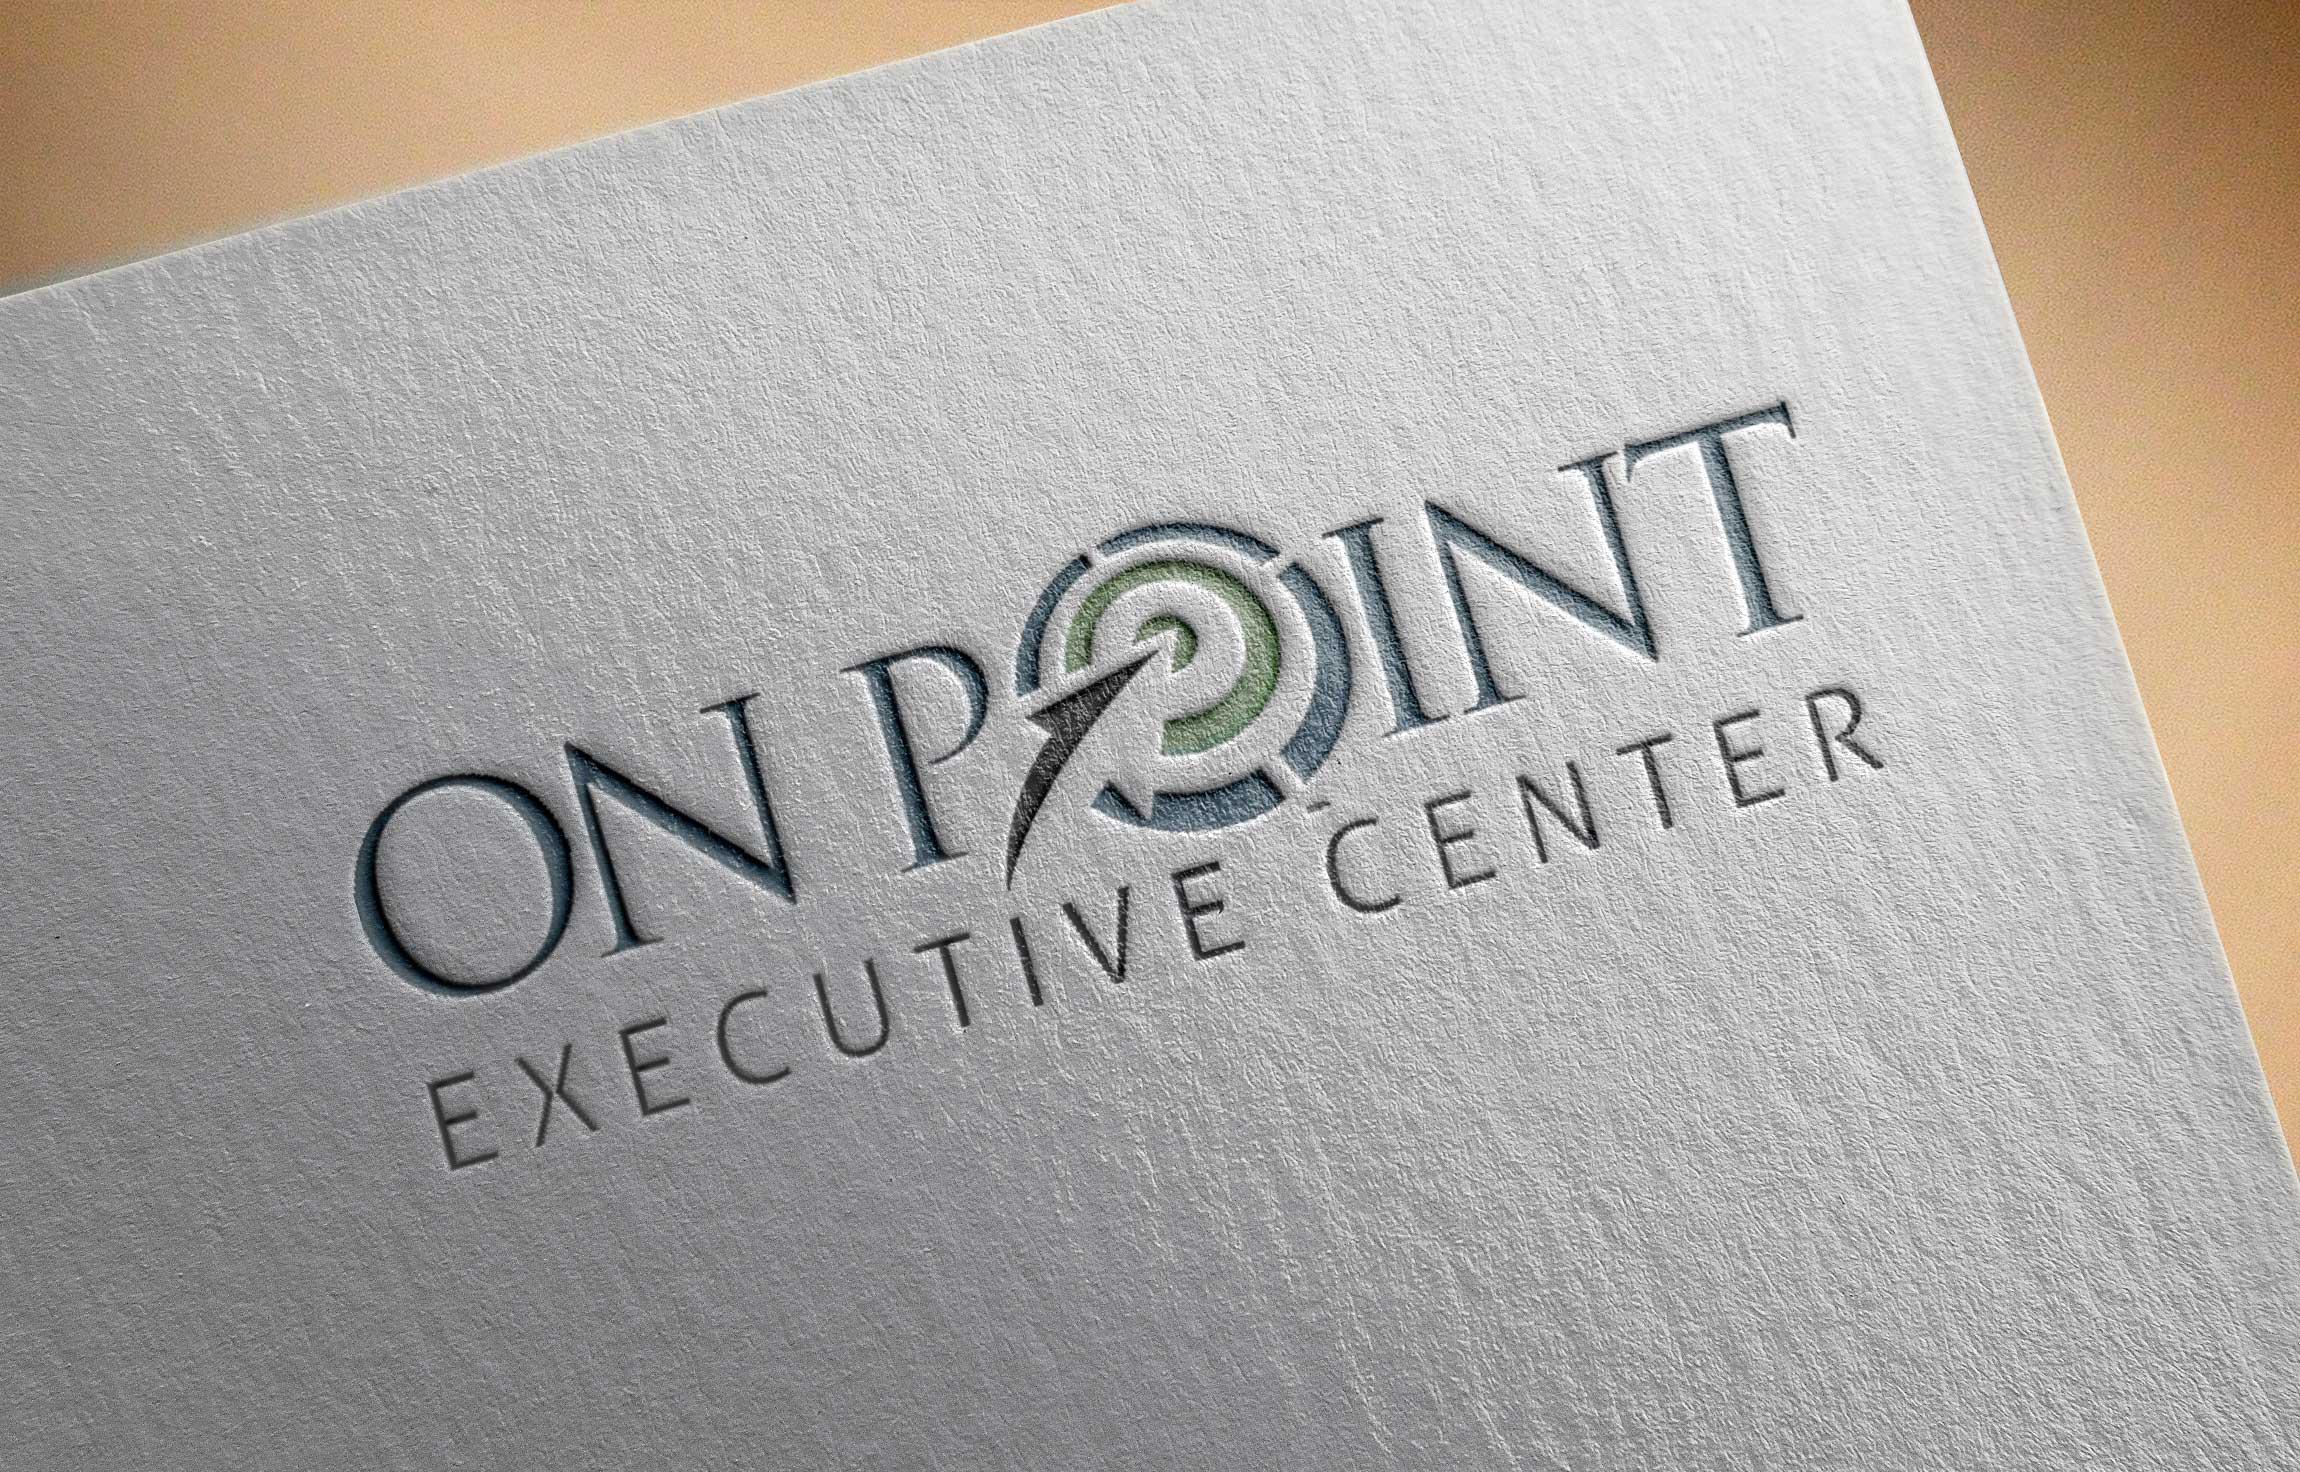 Pop-UpShopOnPoint2017 - ONPOINT-1.jpg